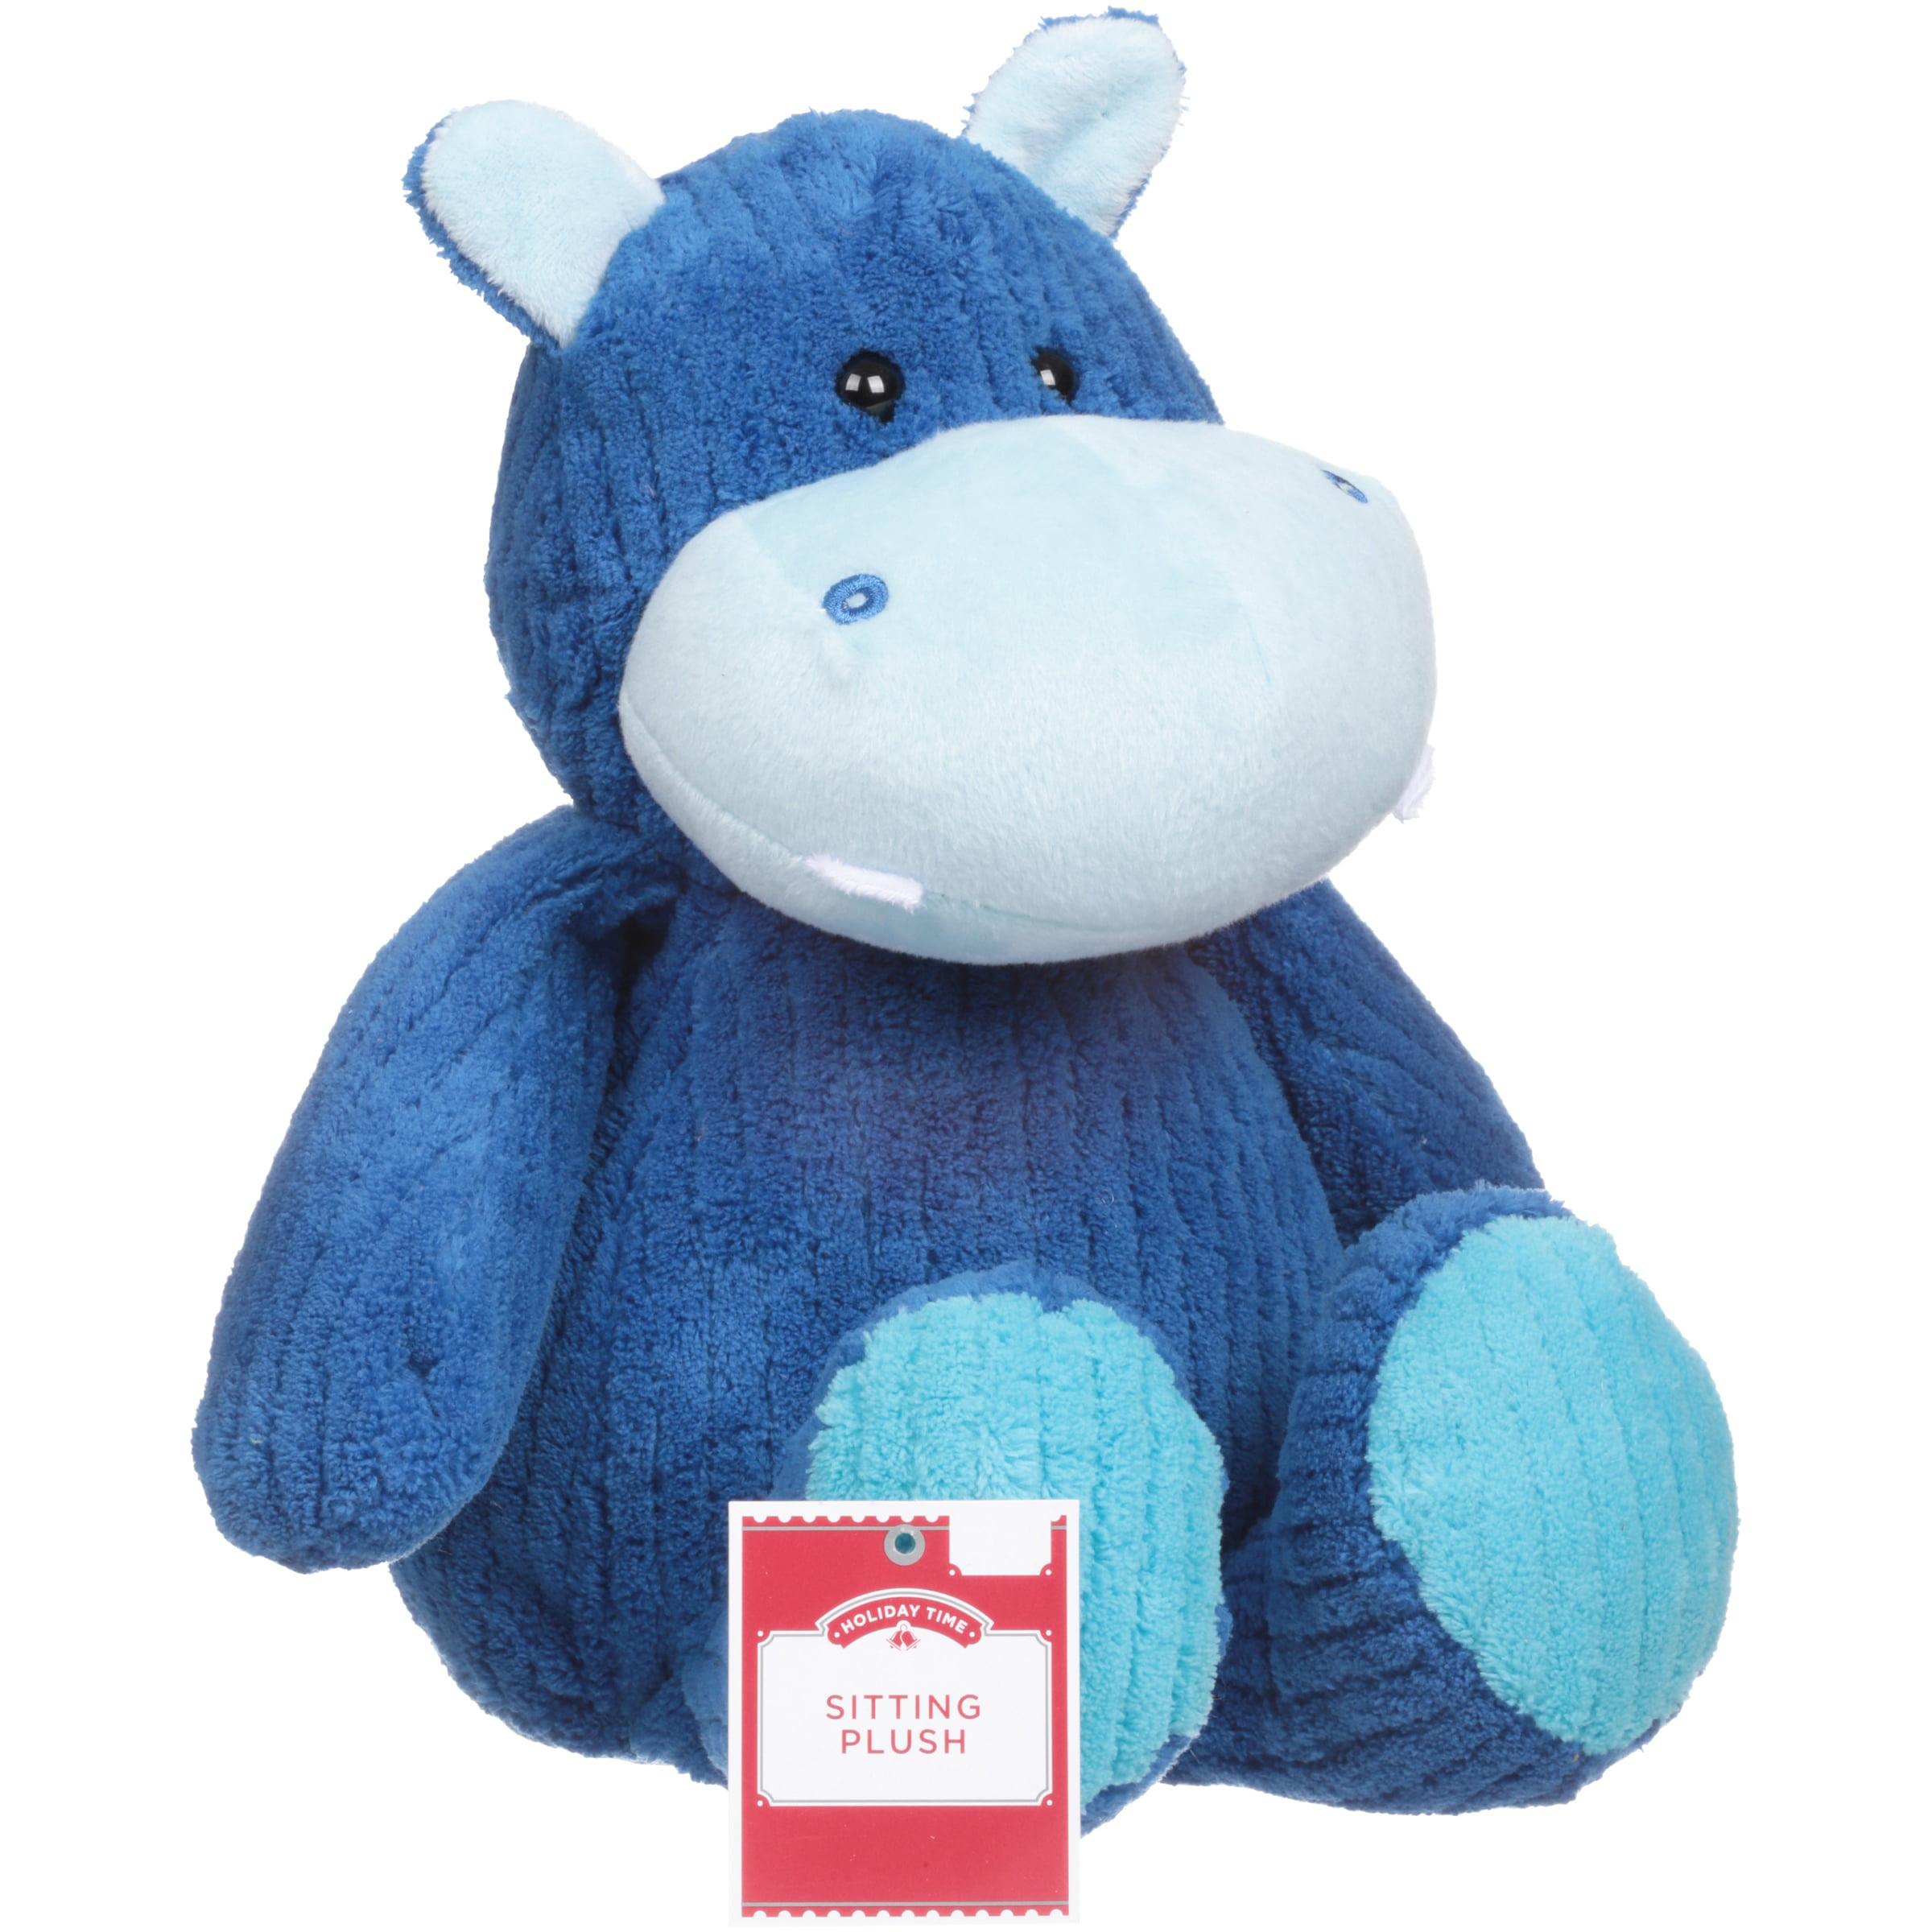 Holiday Time Sitting Plush Hippo Plush Toy - Walmart.com